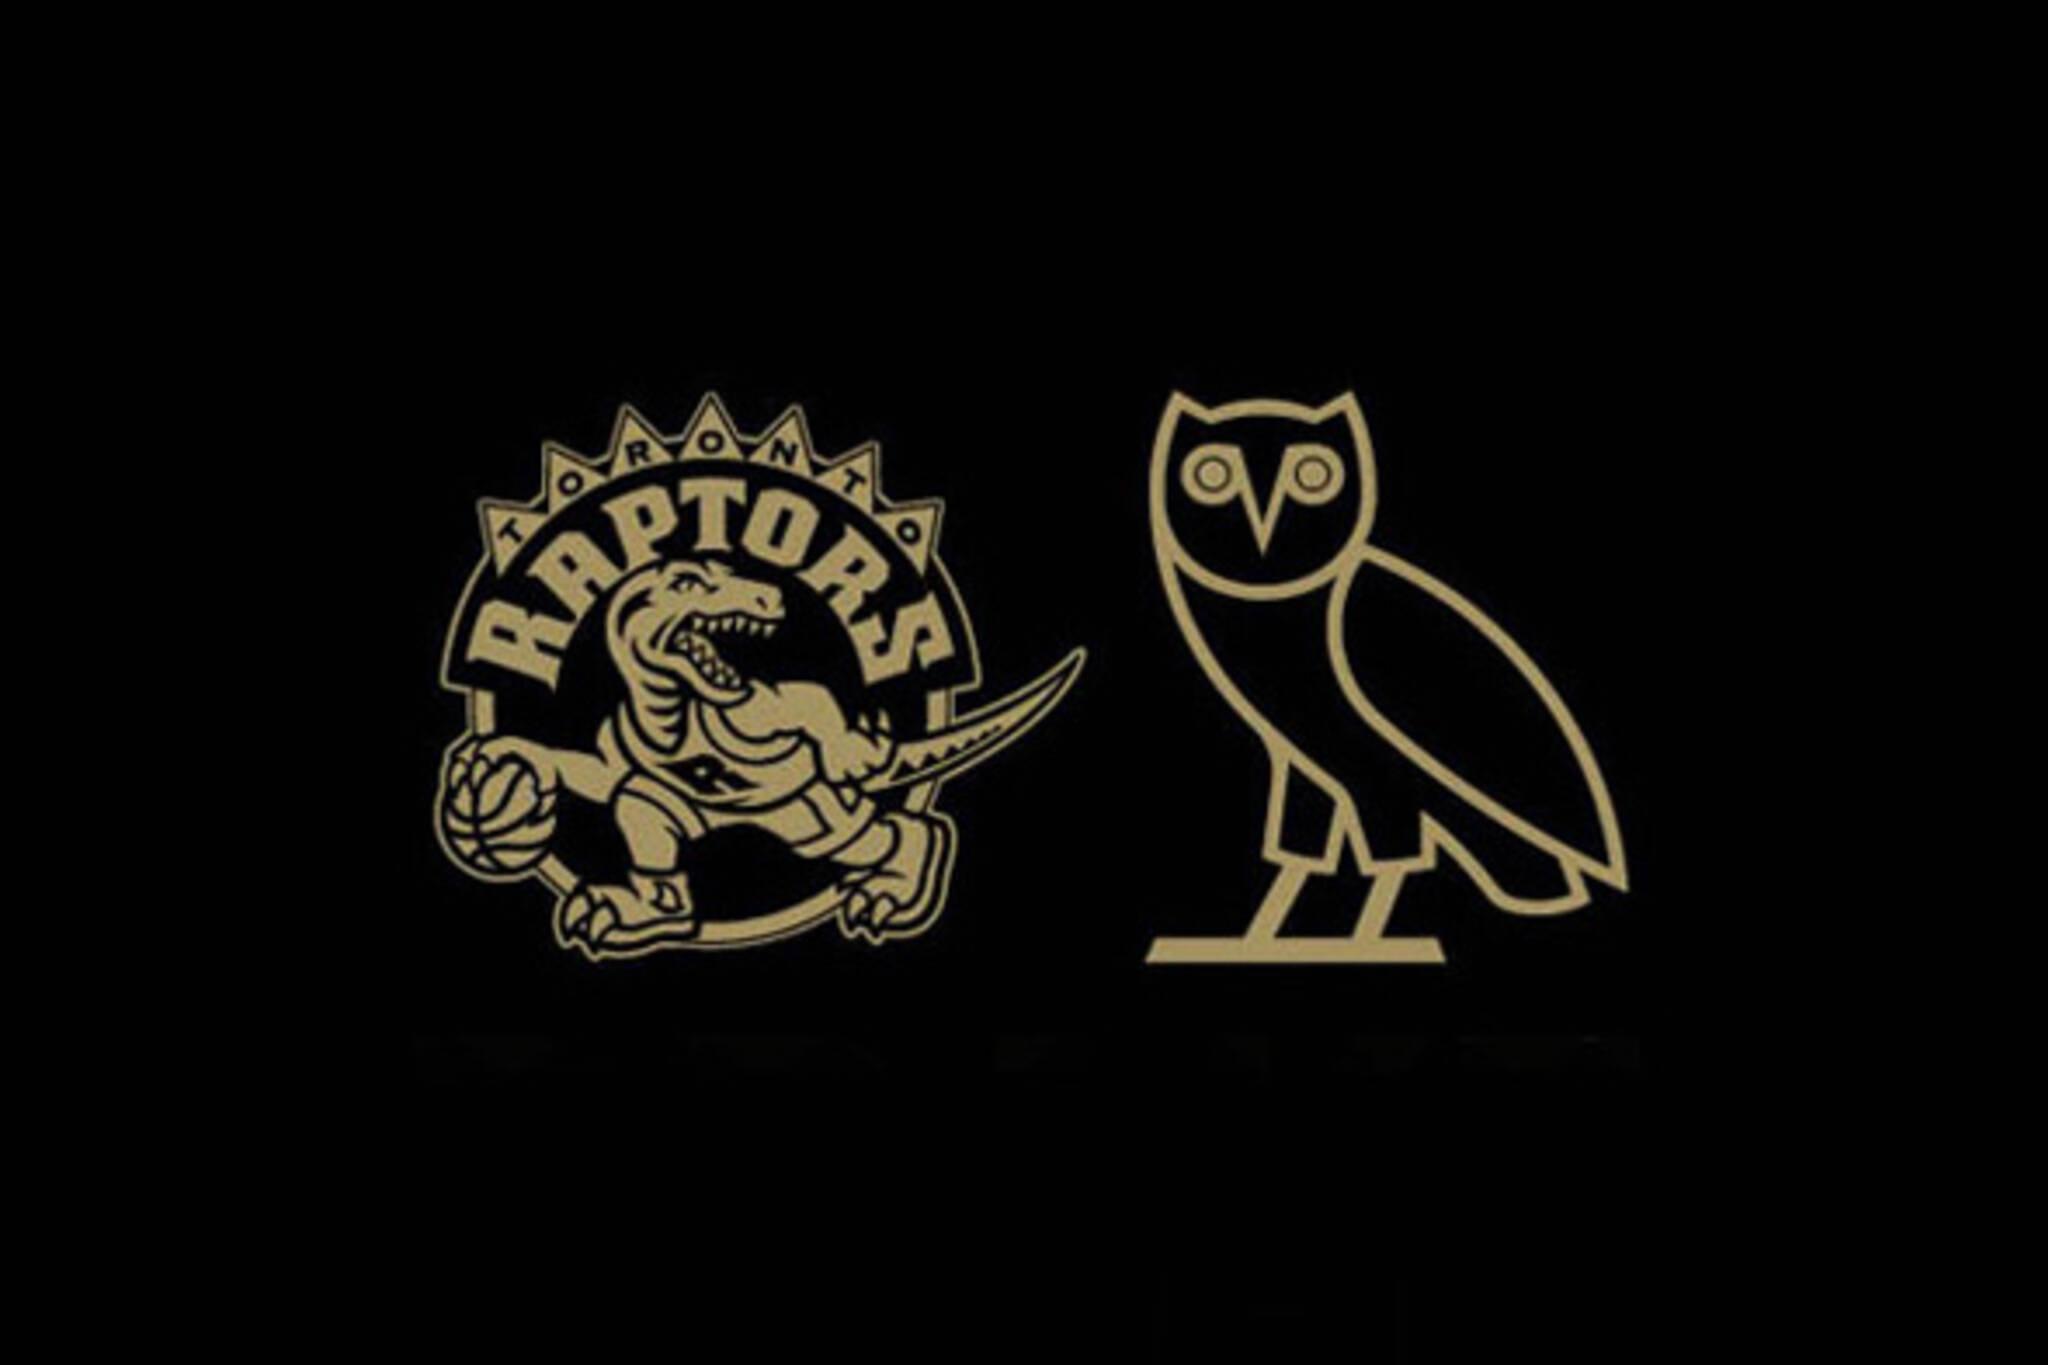 Night Owl Vintage Clothing